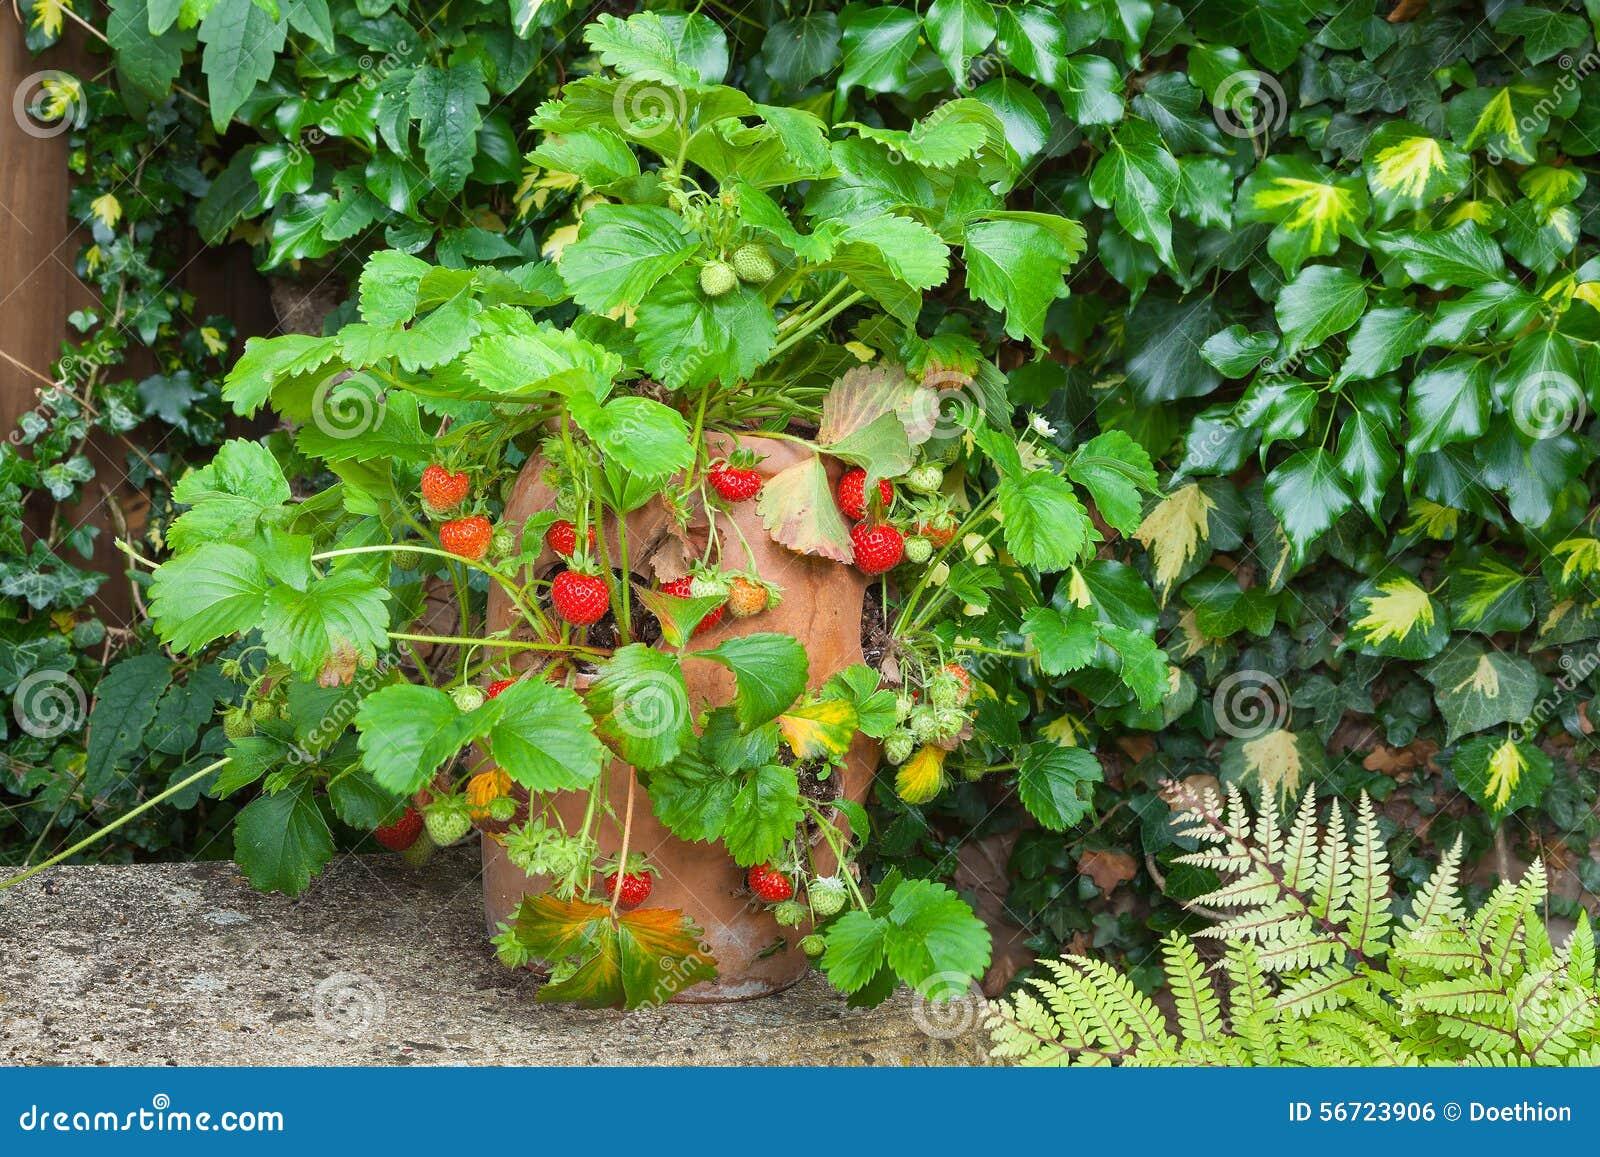 Pot fraisier terre cuite - Nain de jardin en terre cuite ...